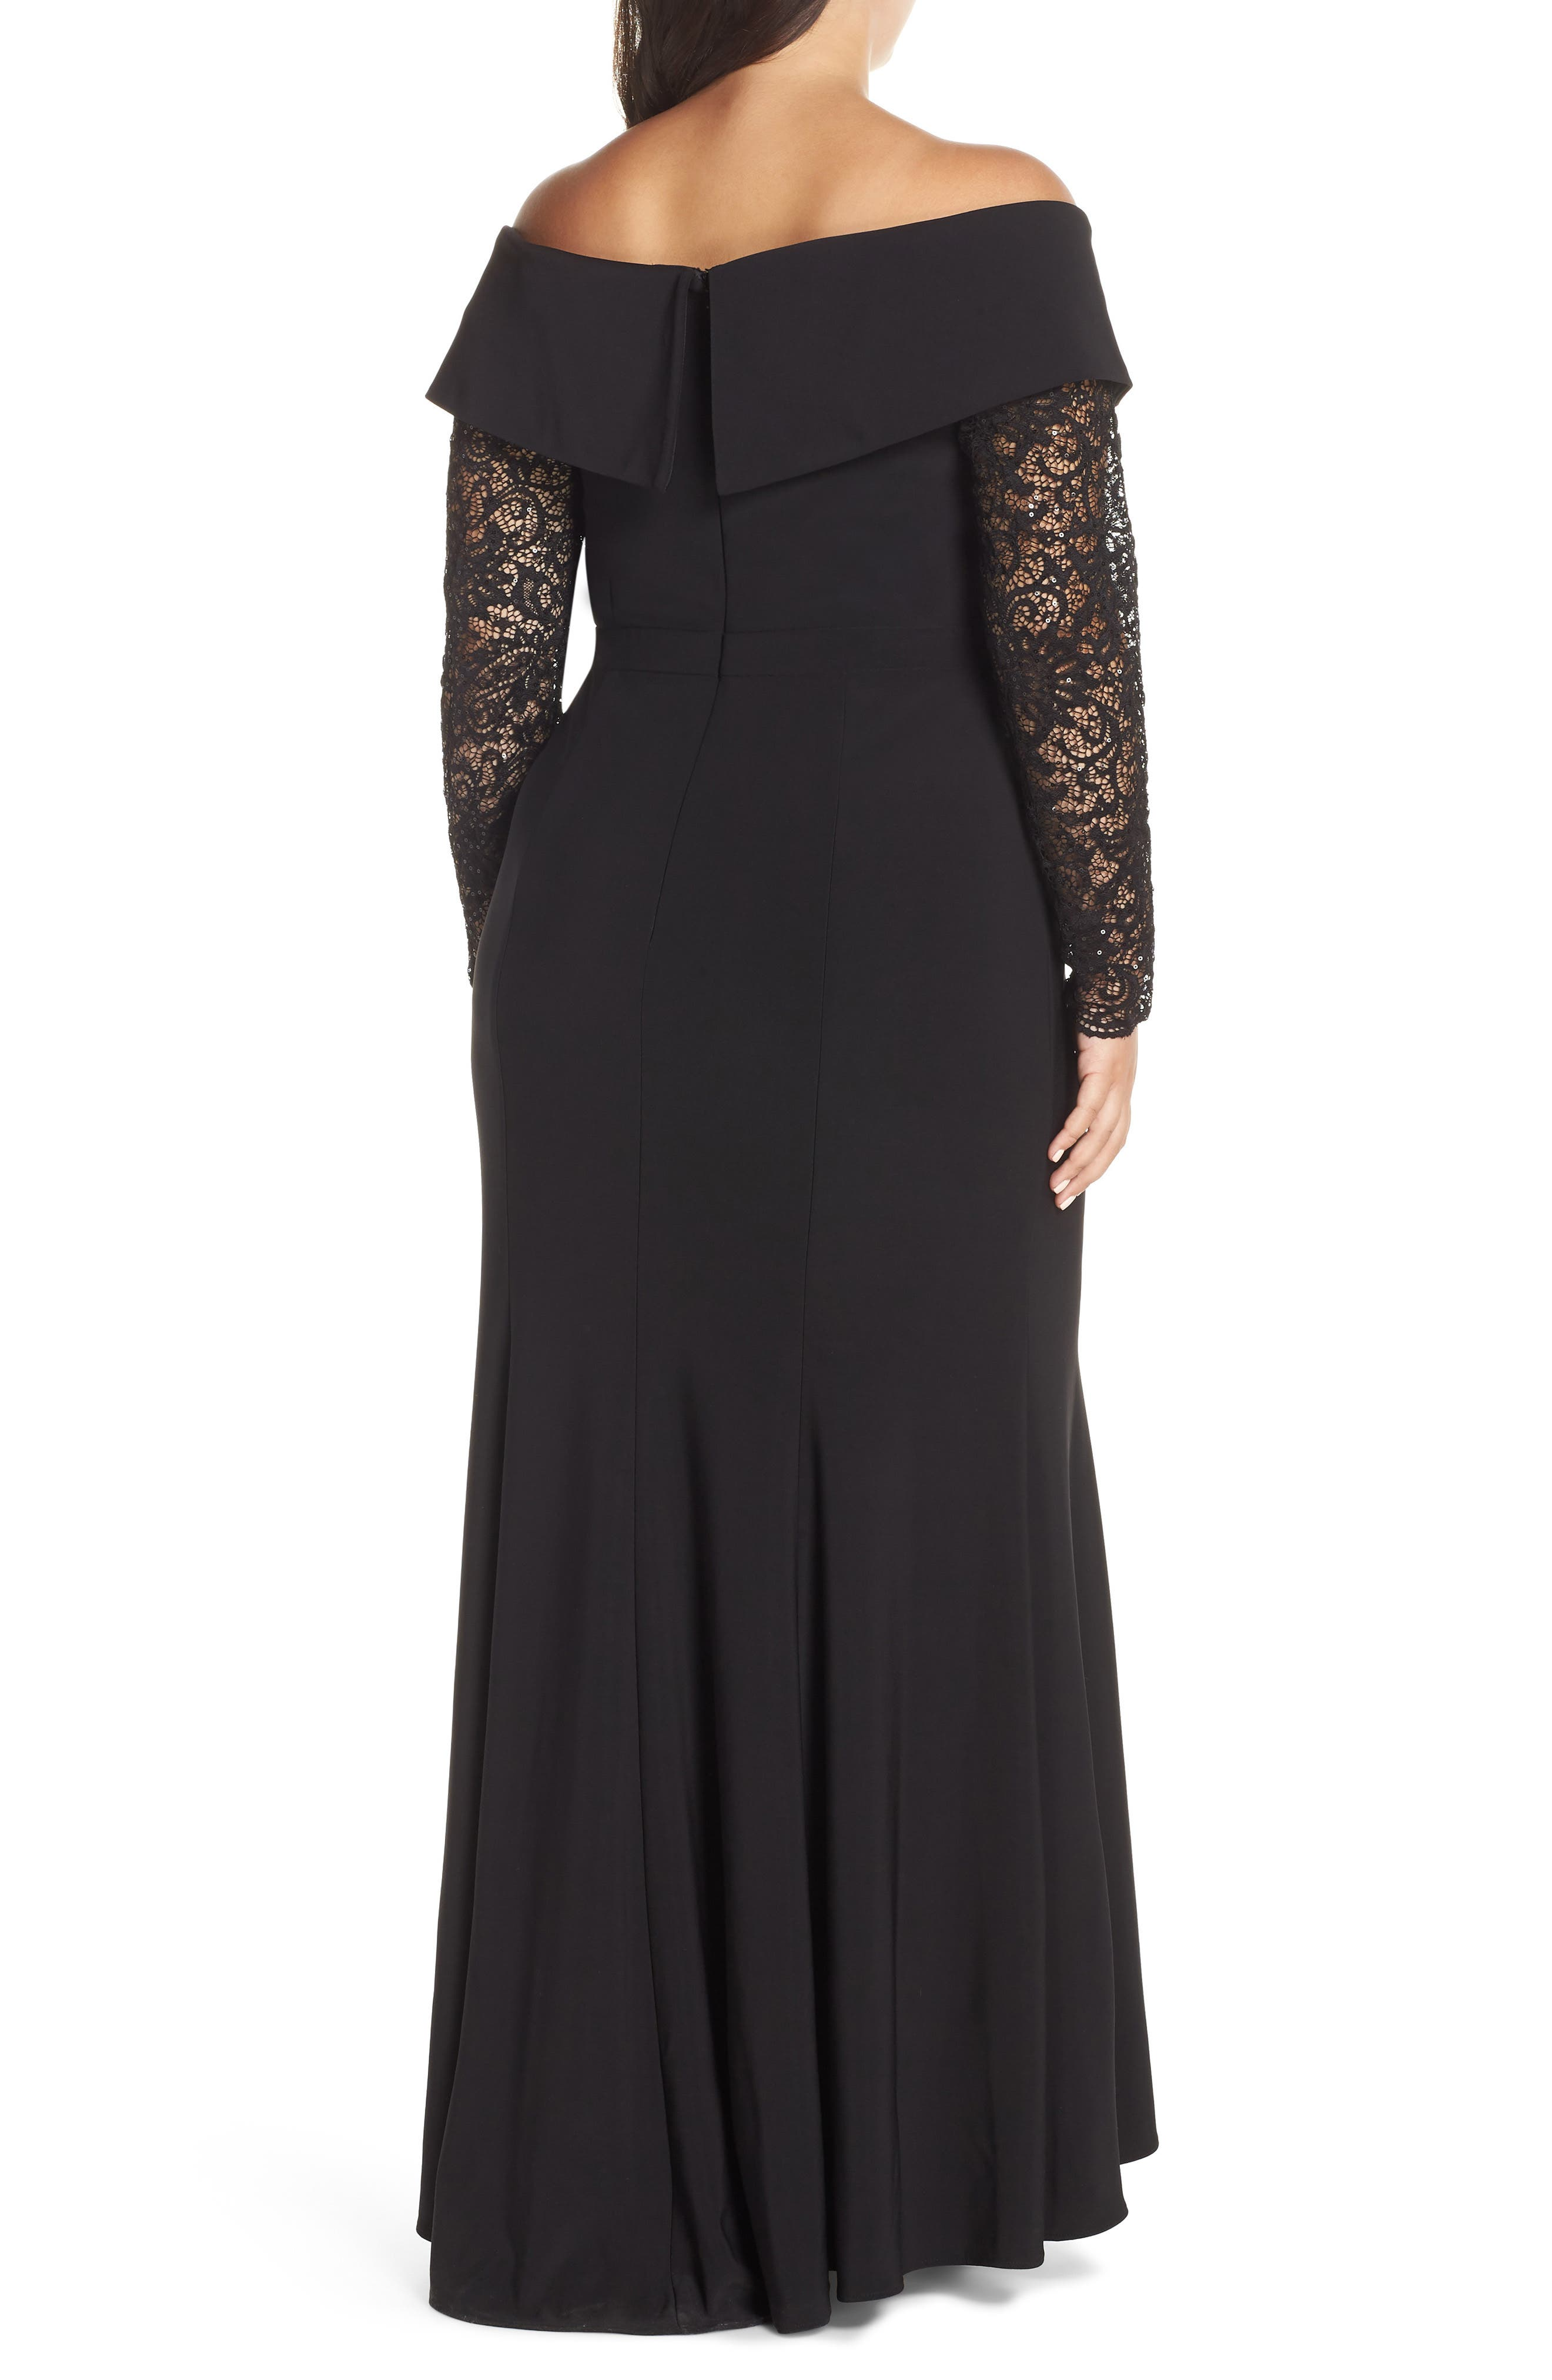 XSCAPE, Off the Shoulder Lace Sleeve Evening Gown, Alternate thumbnail 2, color, BLACK